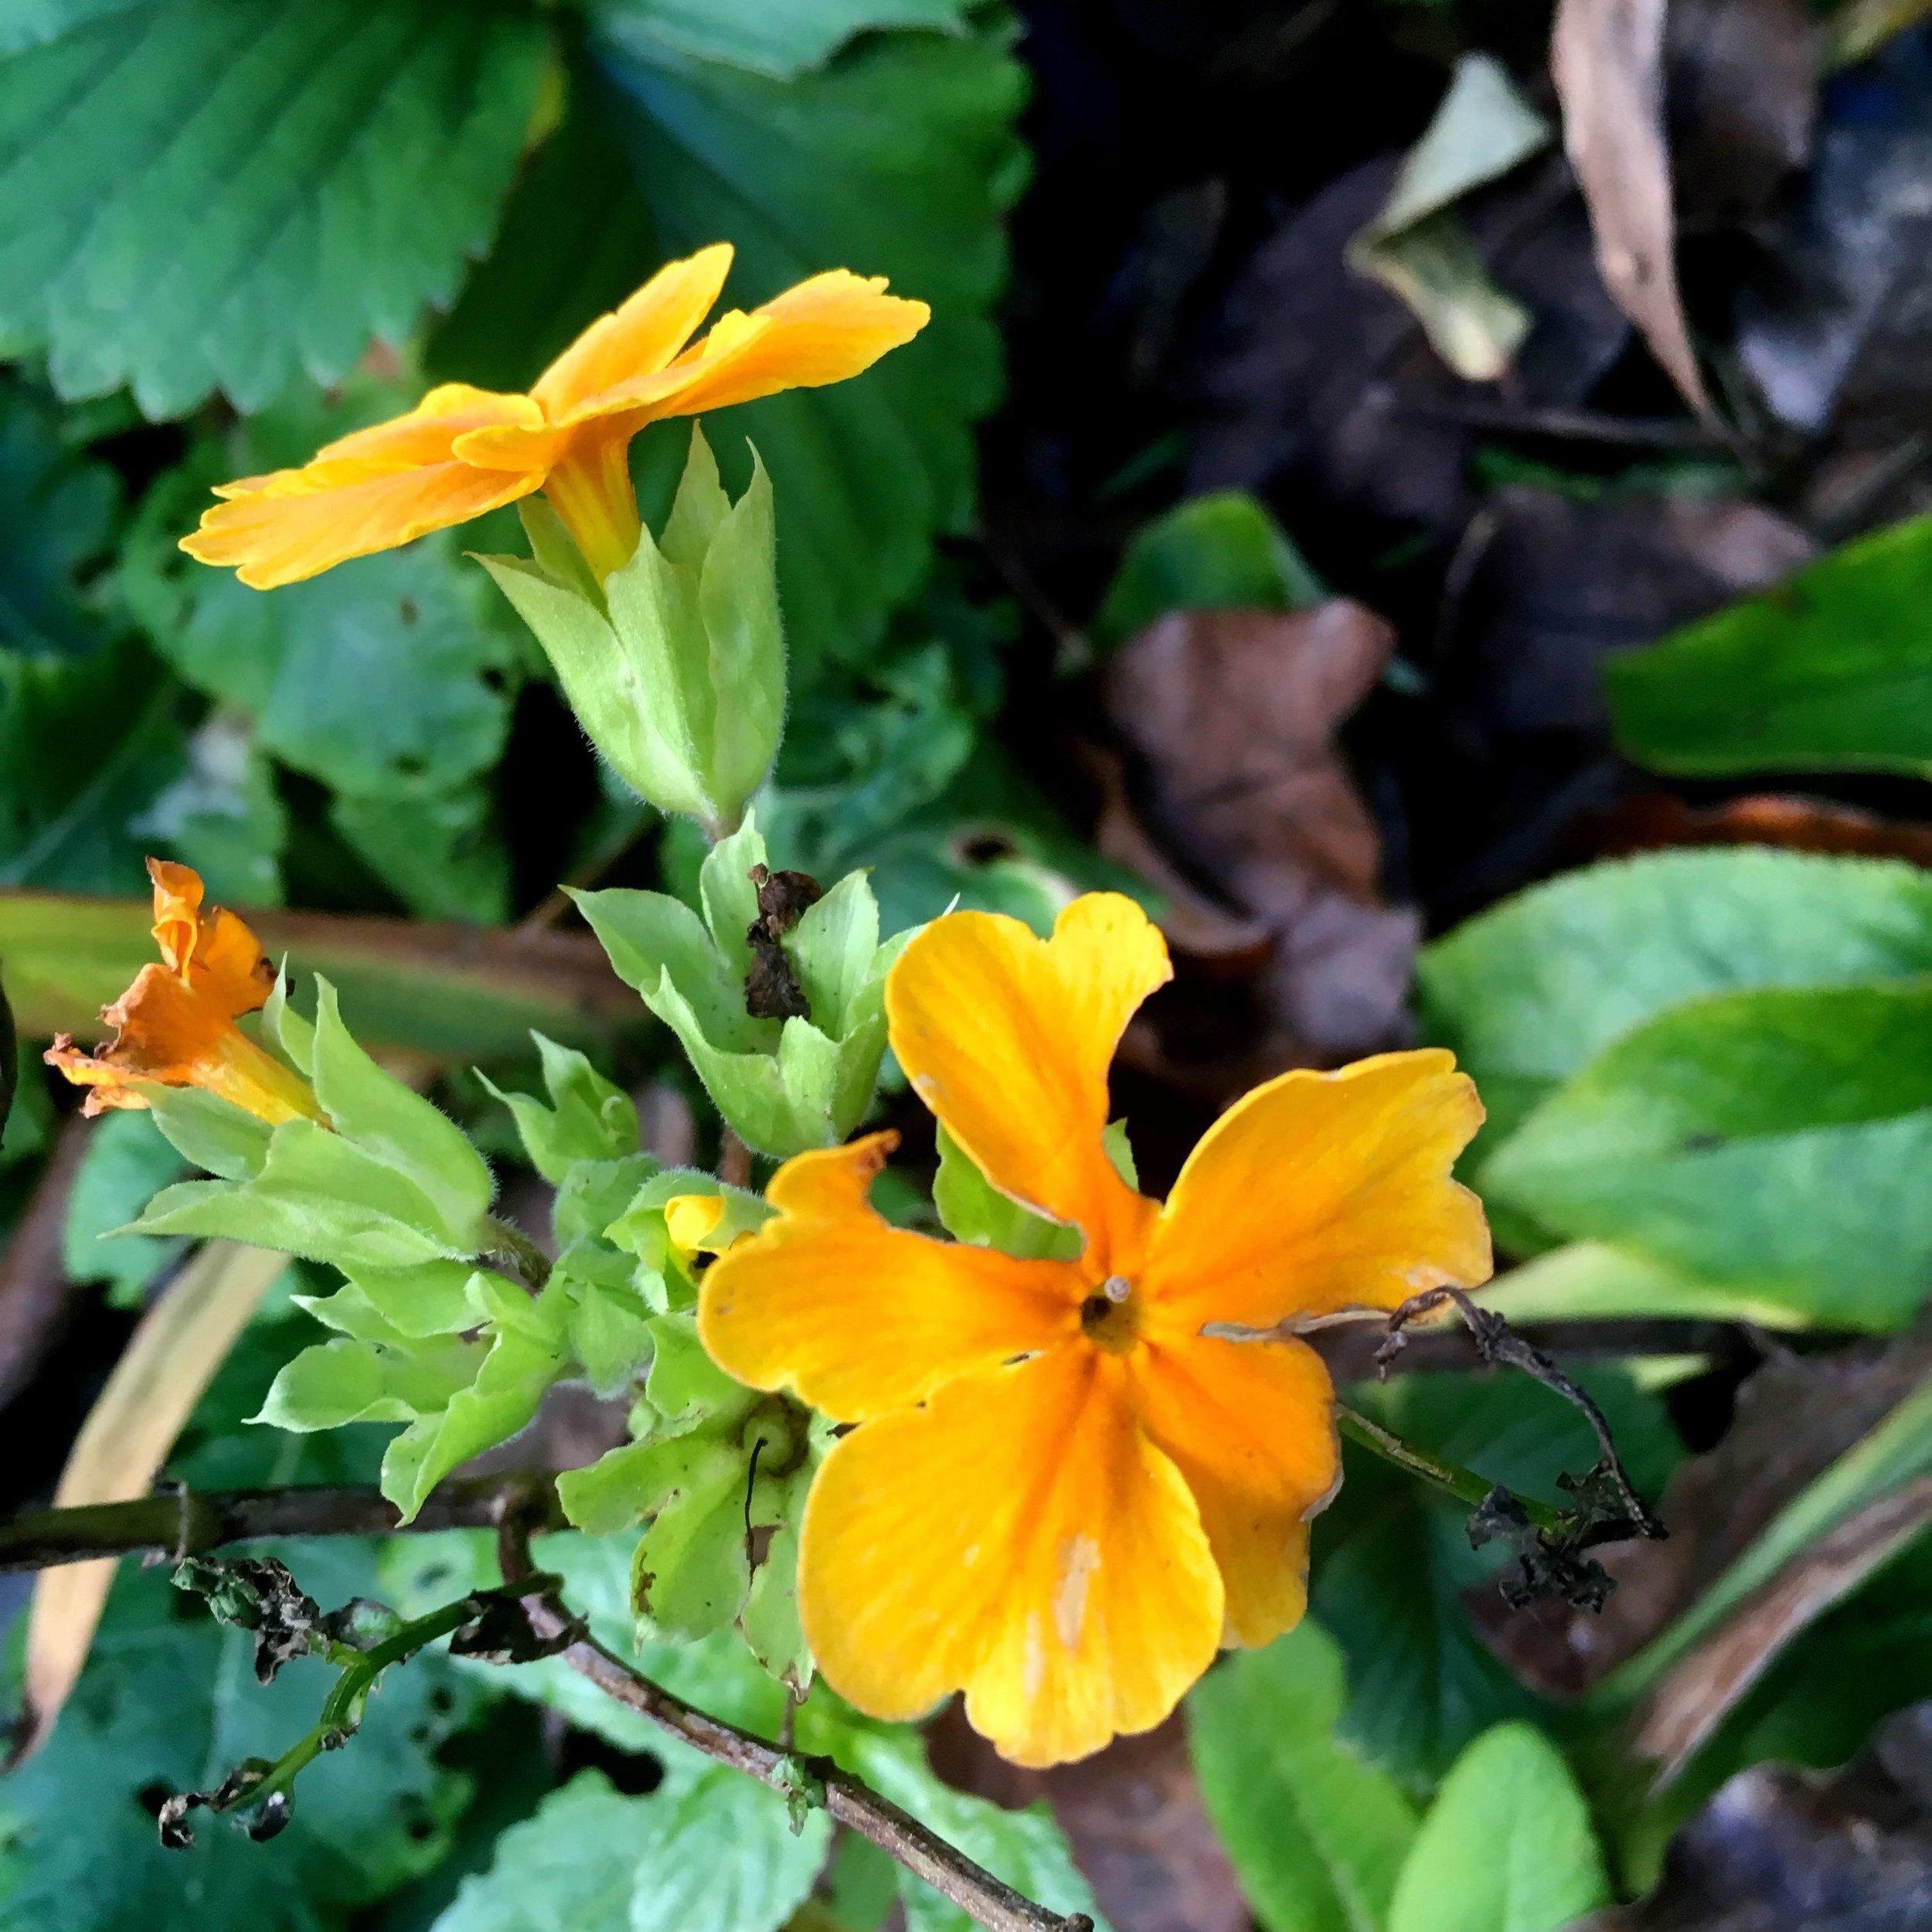 yellow primroses in flower again